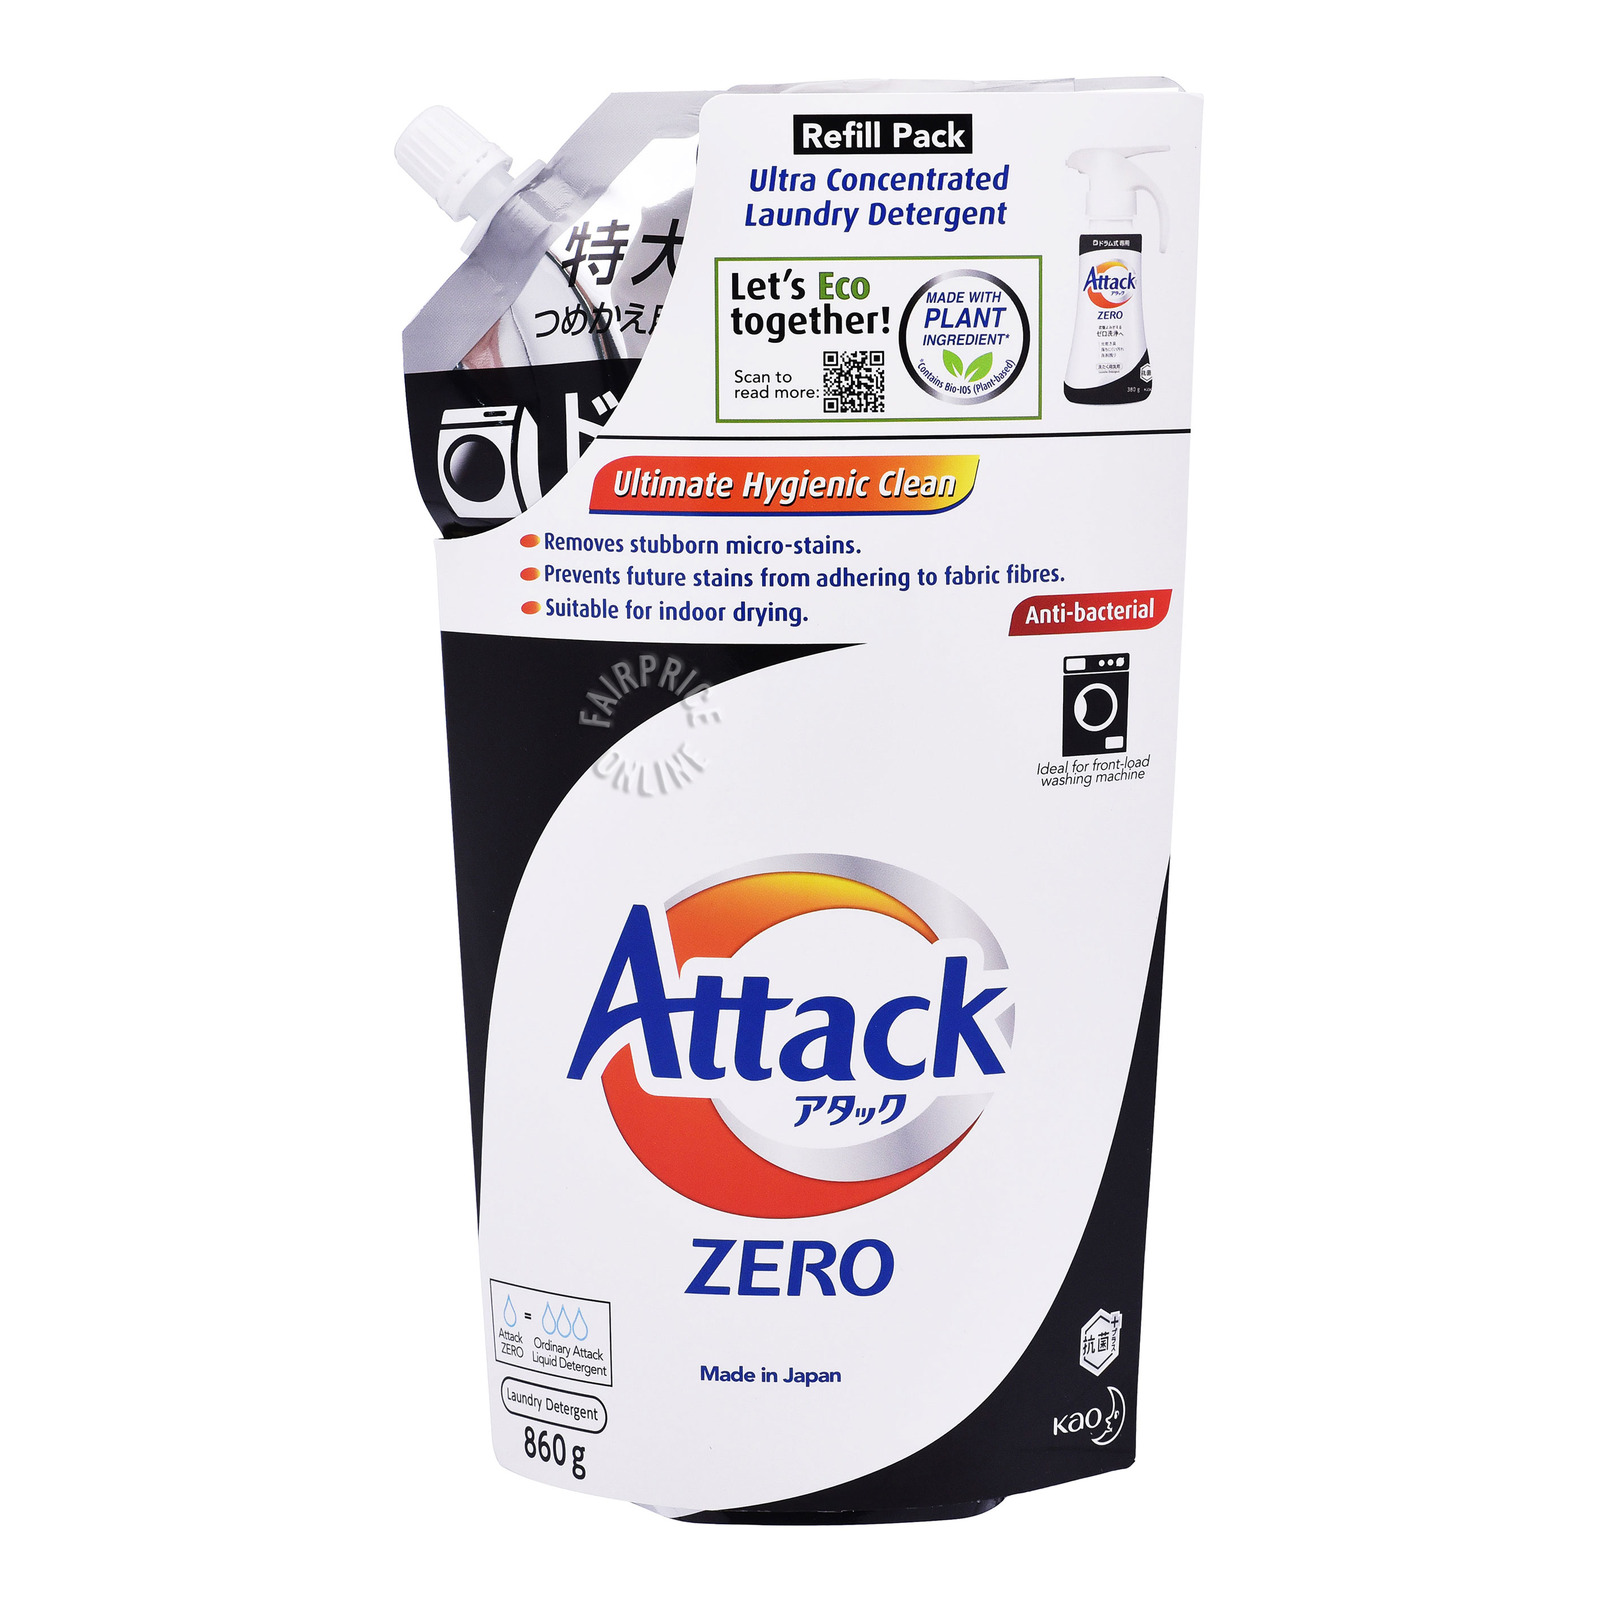 Attack Laundry Detergent Refill - Zero